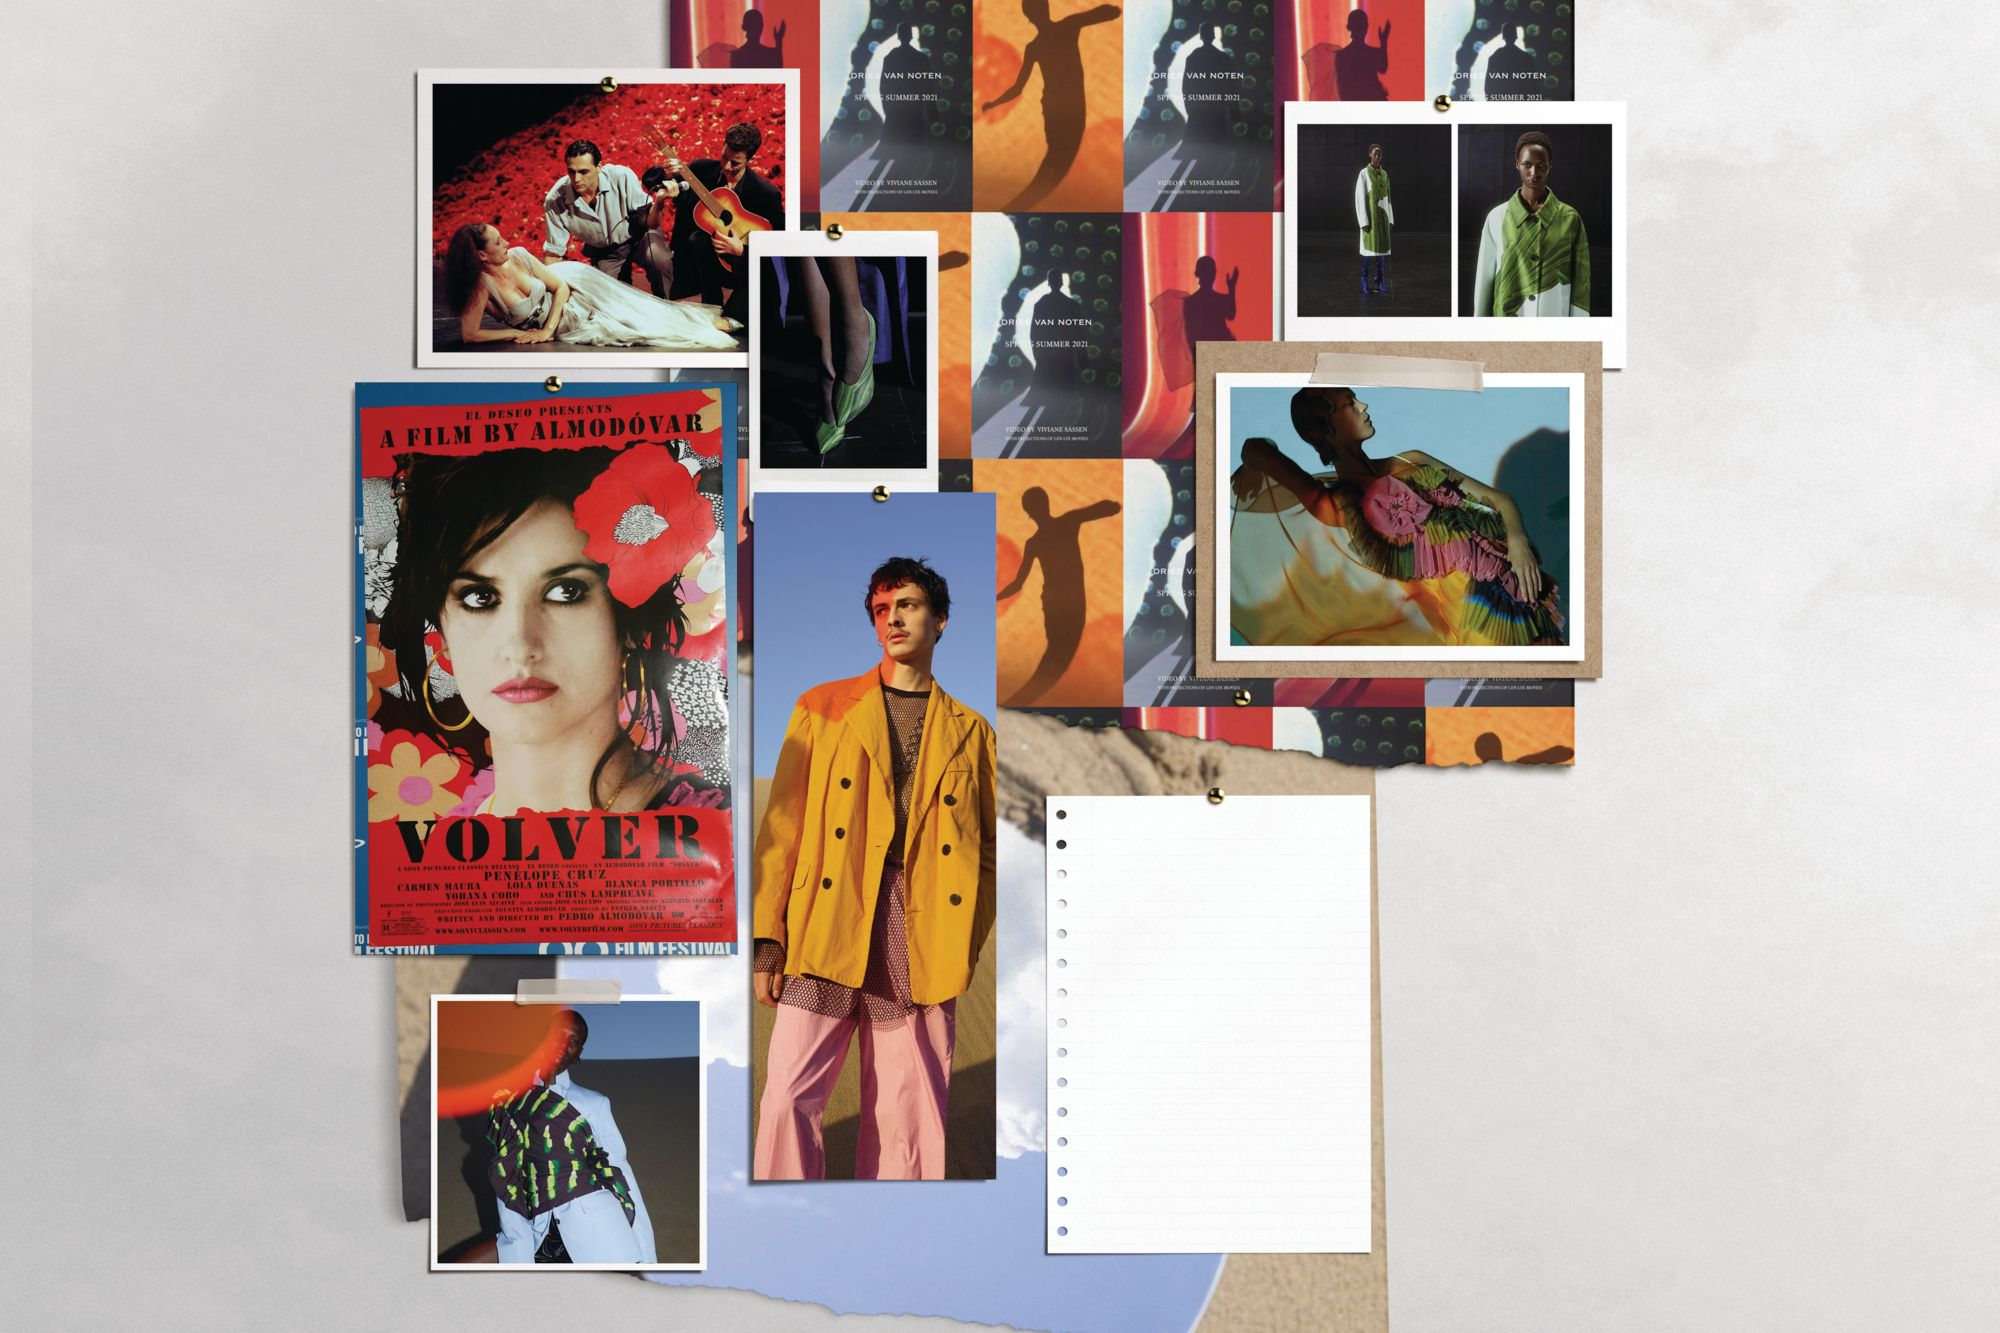 Up Close With Dries Van Noten, Belgium's Most Celebrated Fashion Designer